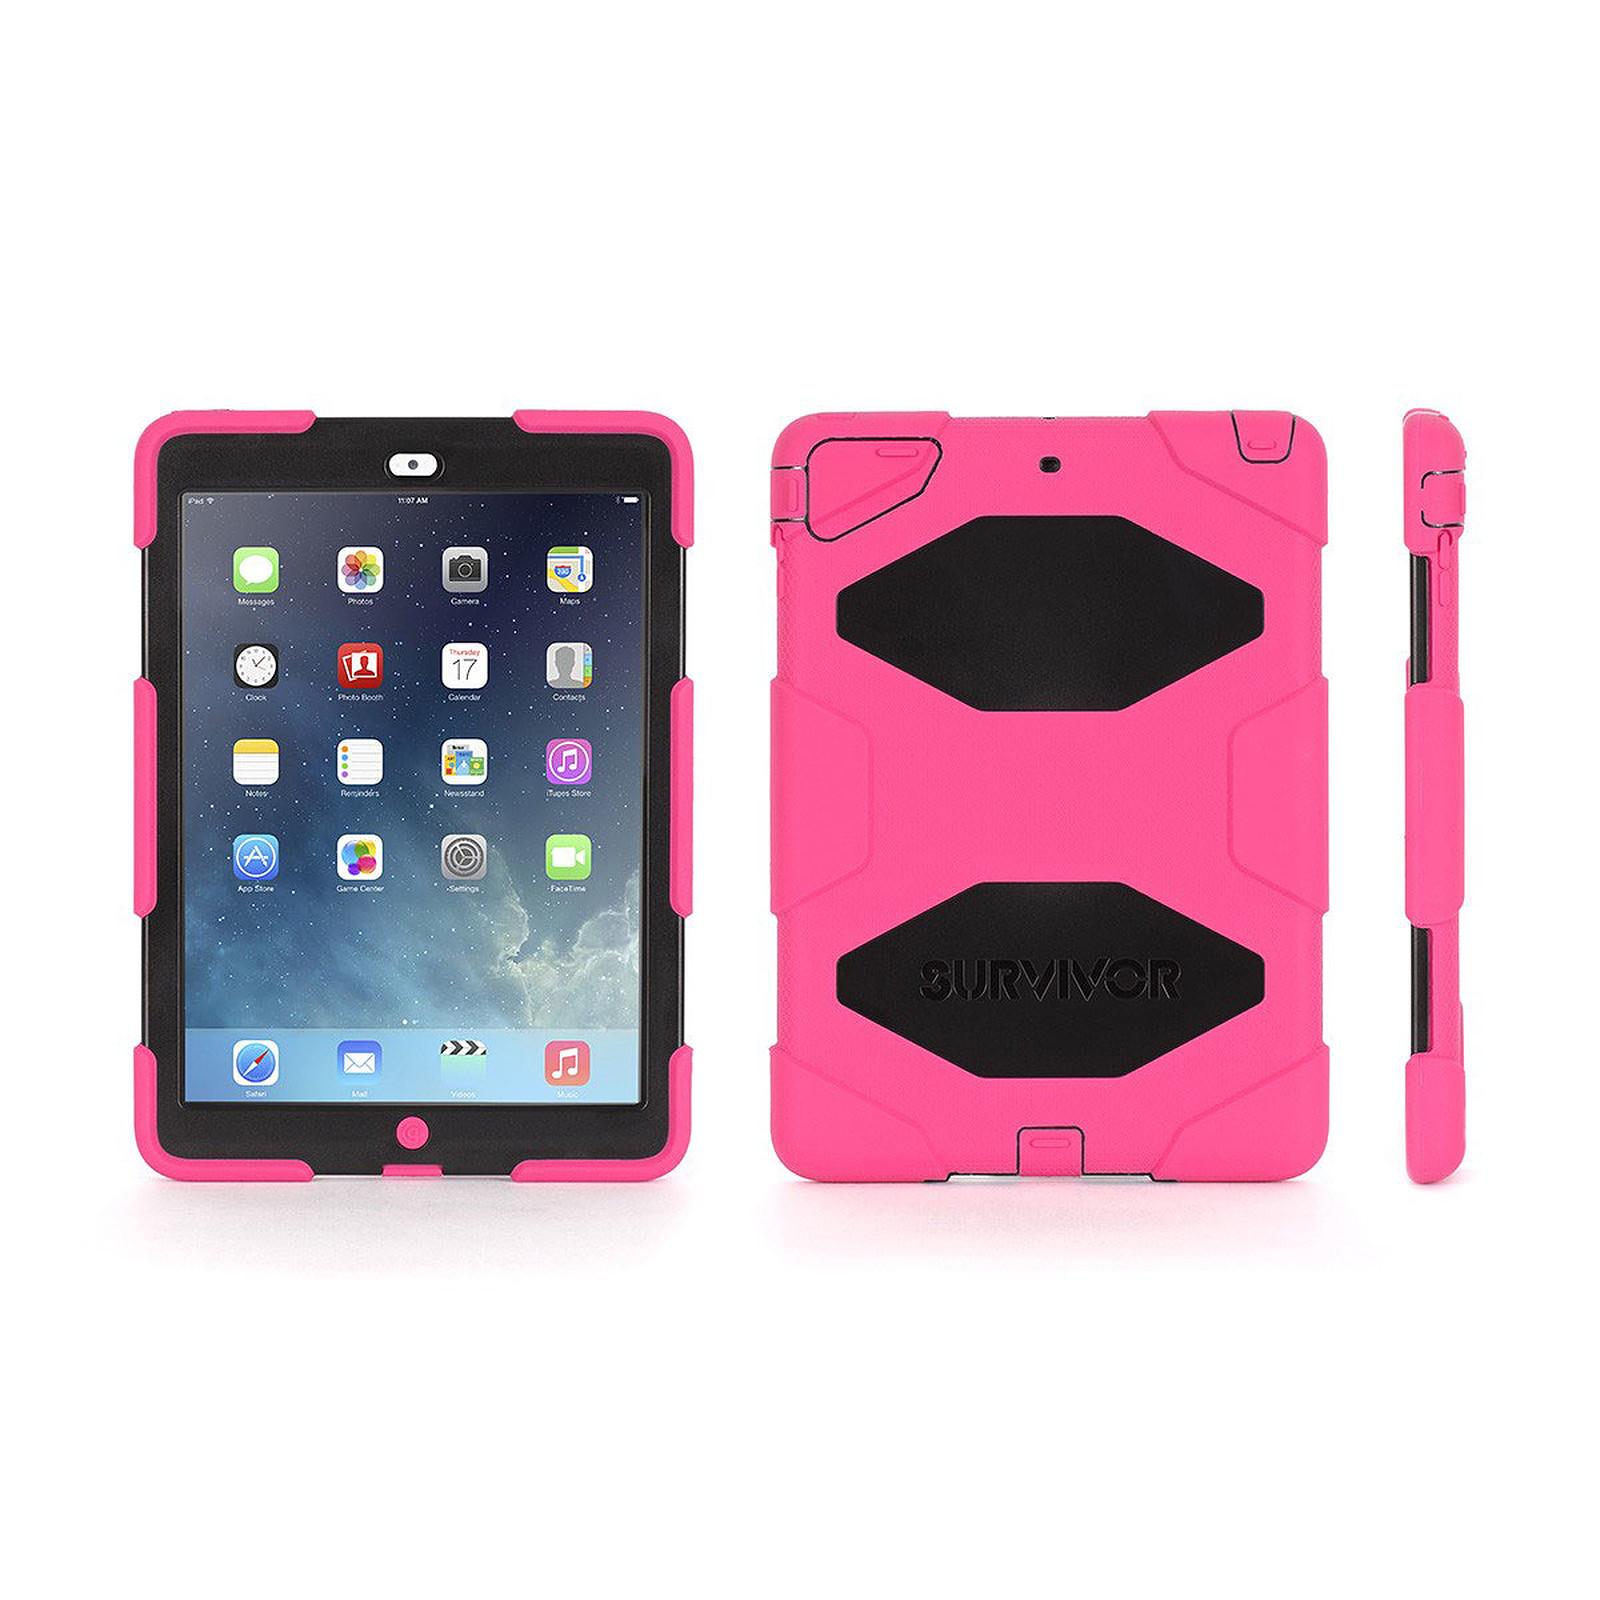 Griffin Survivor for iPad Air 2 Rose/Noir